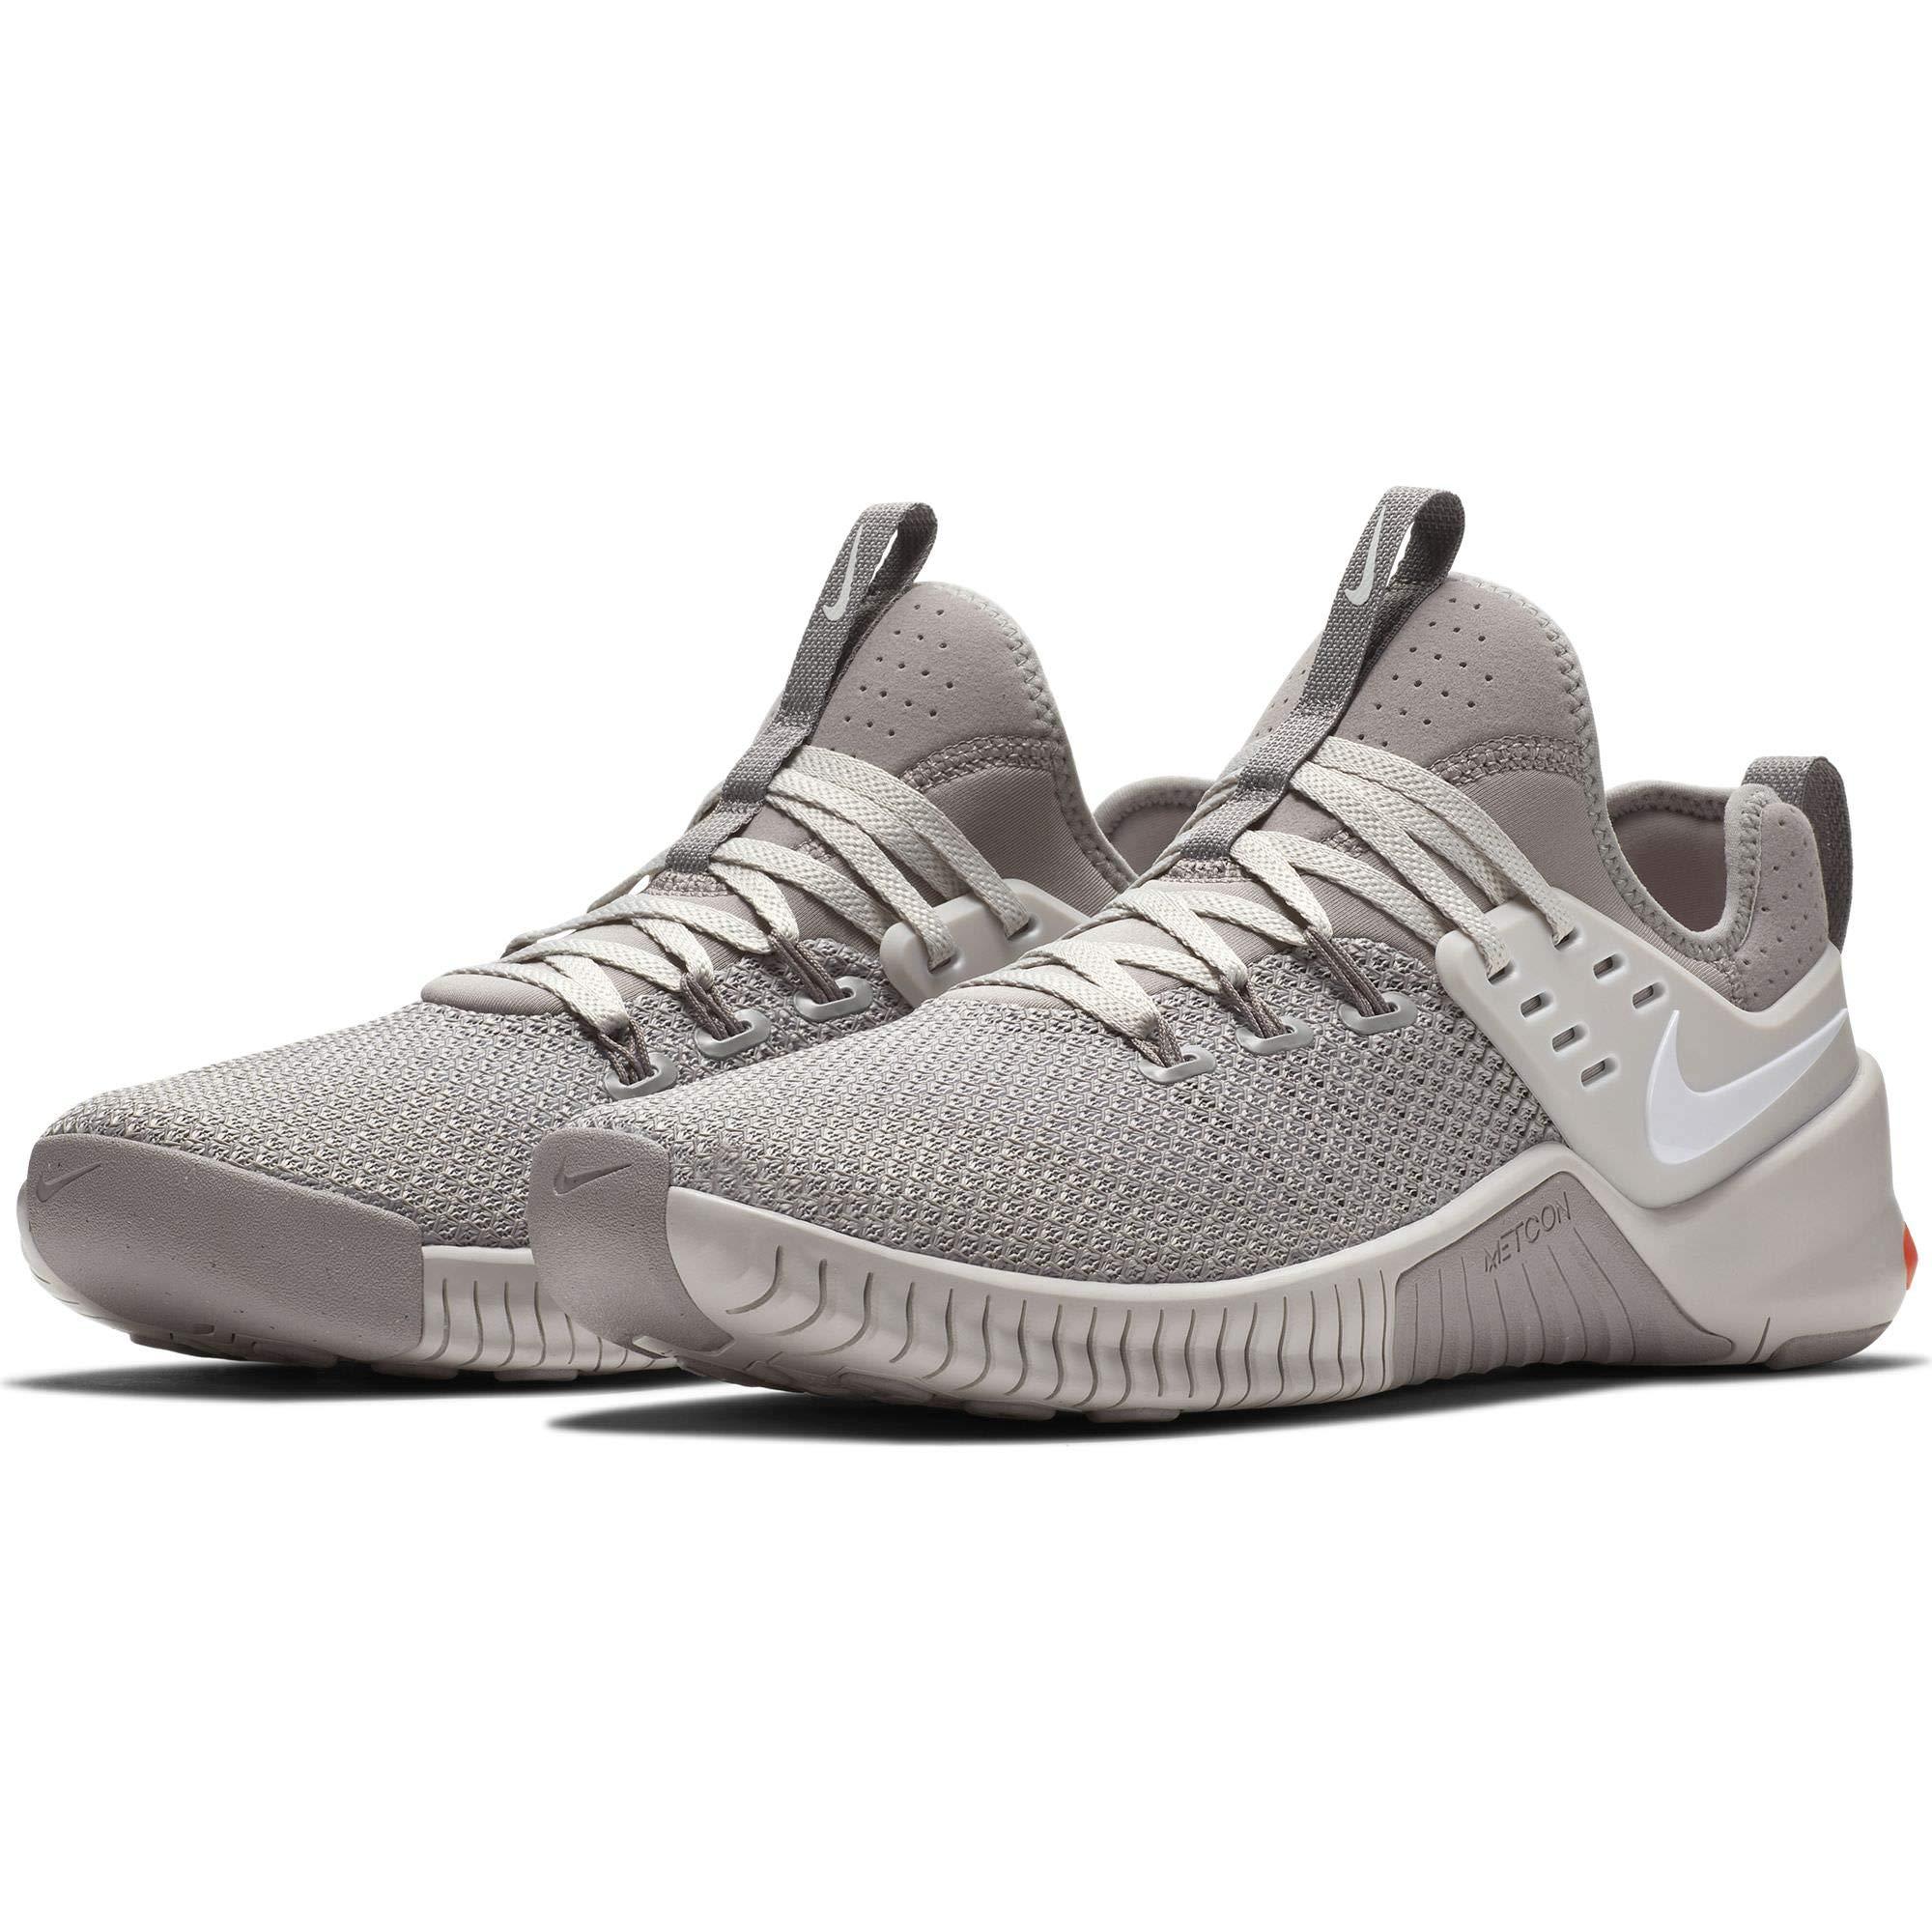 0c0ae03ff4ec Galleon - NIKE Men s Metcon Free Training Shoe Atmosphere Grey White-VAST  Grey 8.5